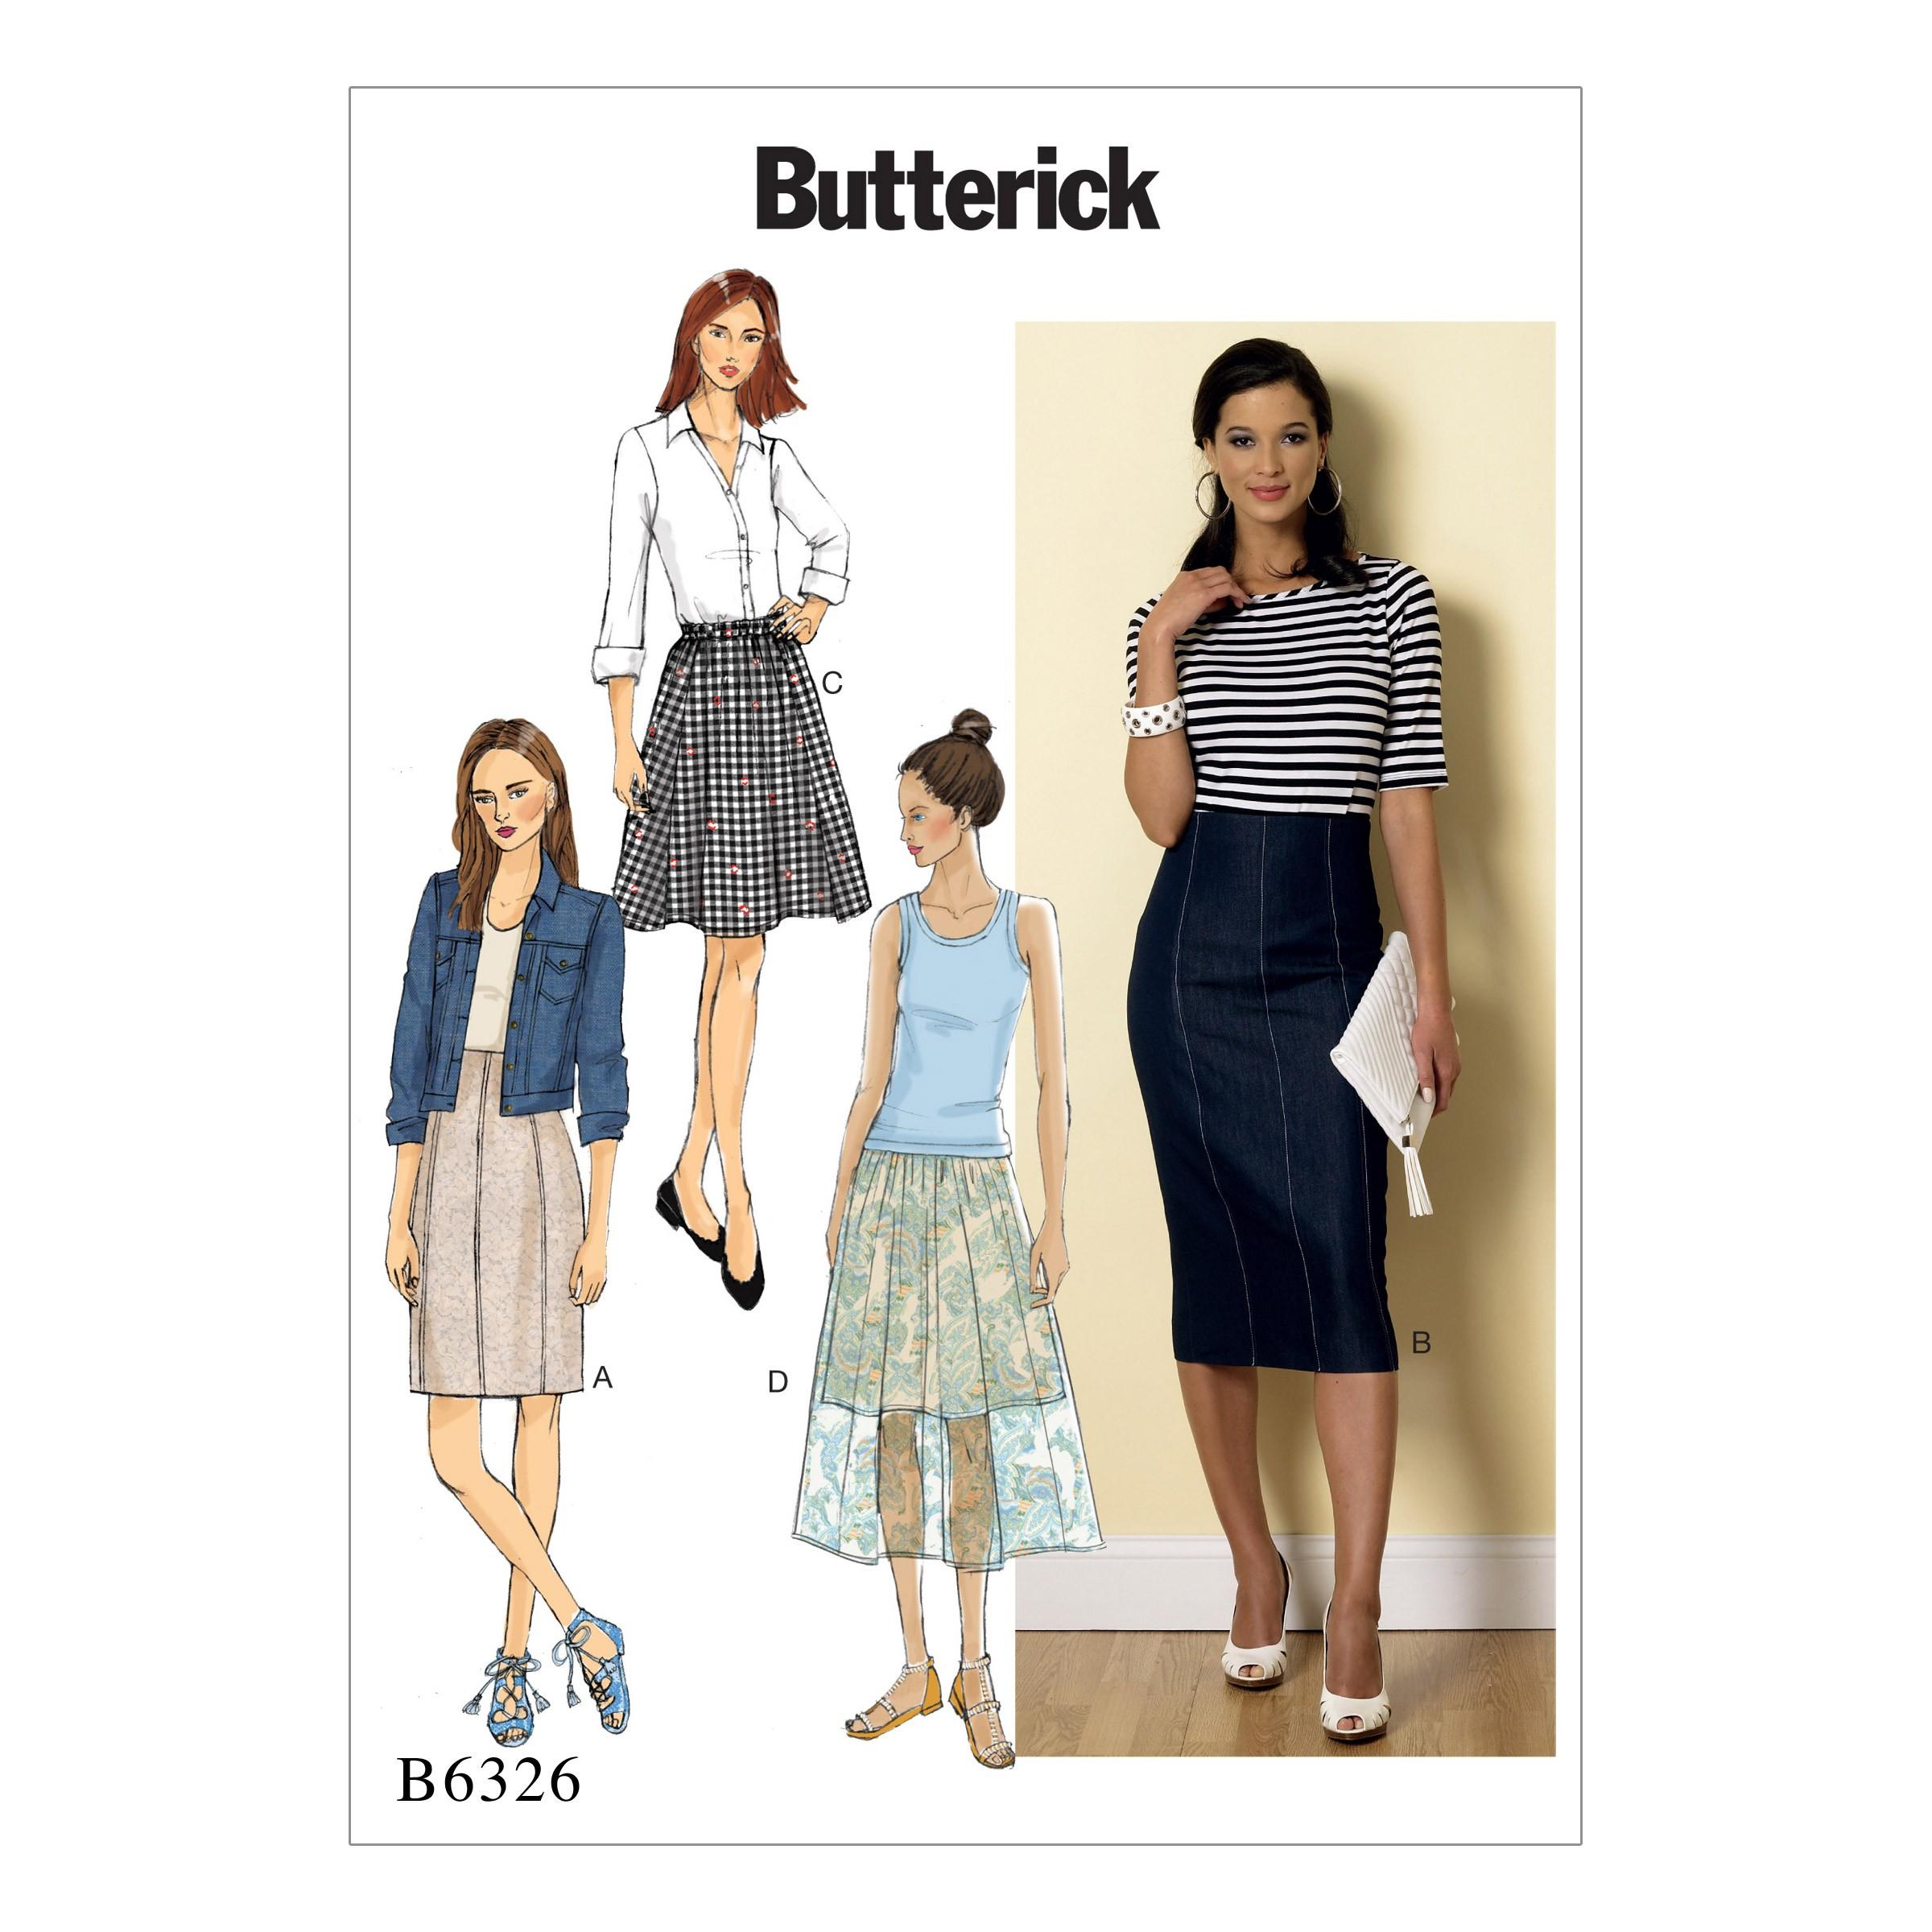 Butterick Sewing Pattern 6326 Misses' Rasied Waist or Elastic Waist Skirts